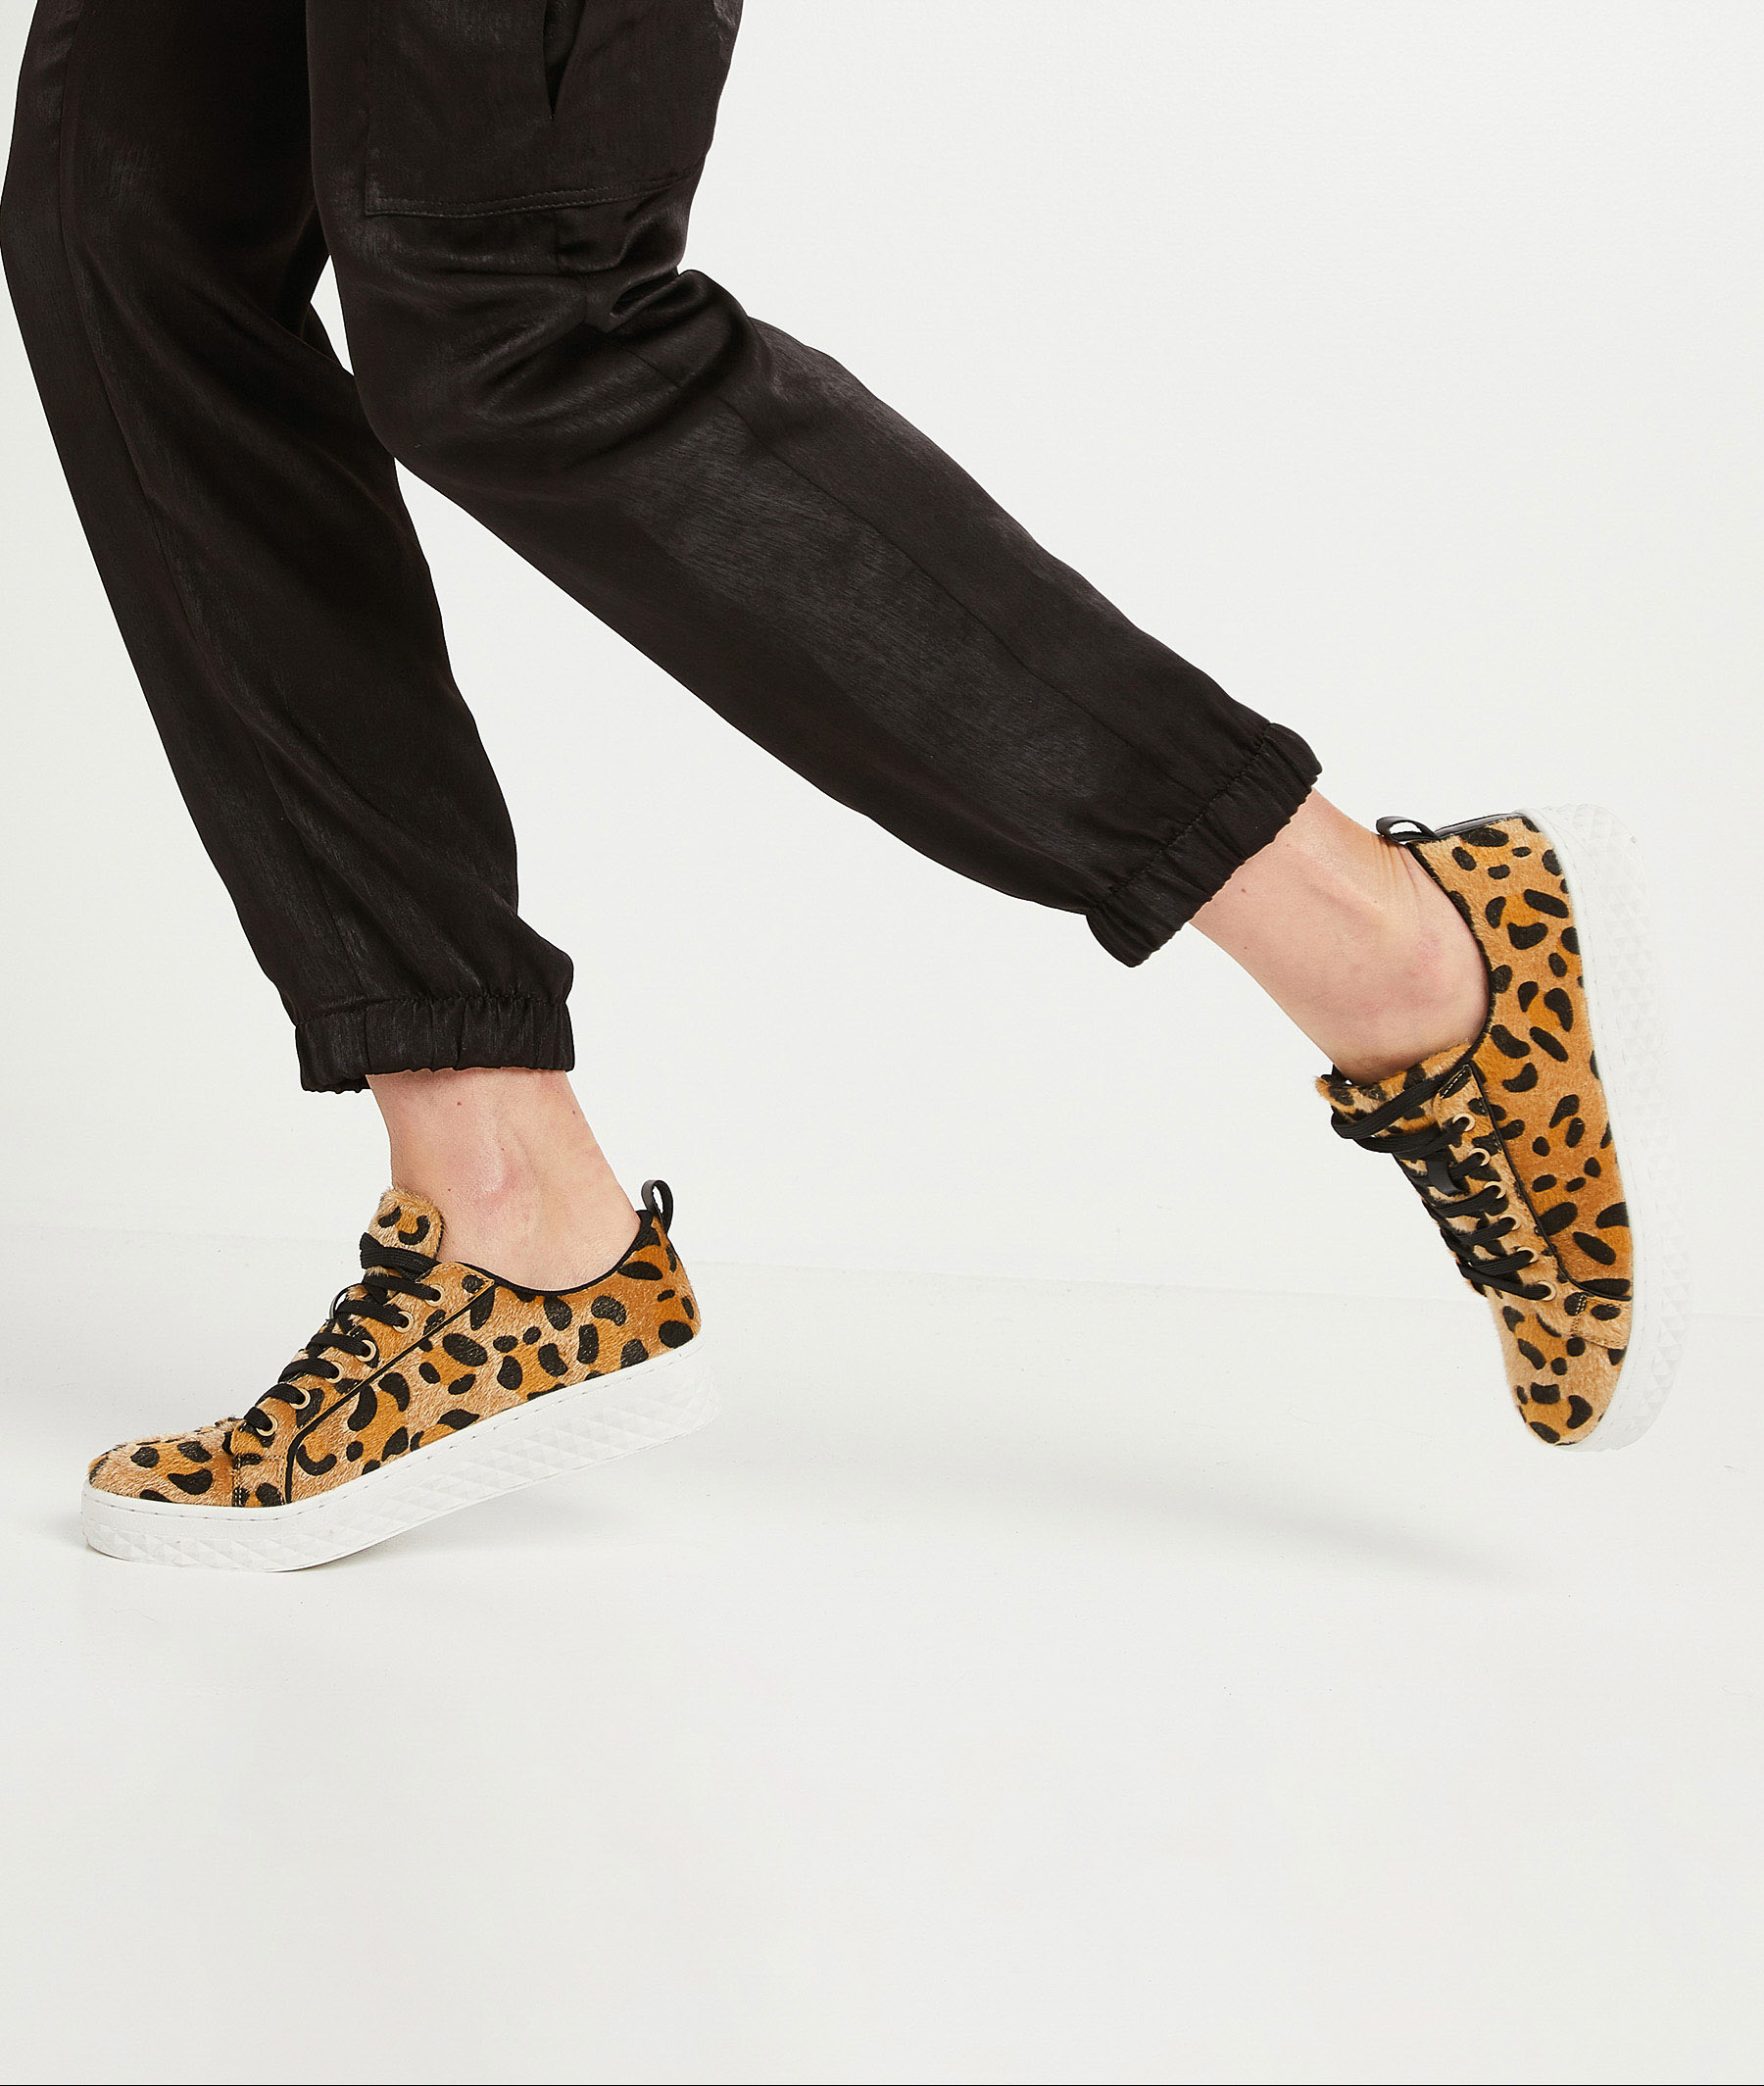 Baskets imitation léopard femme LEOPARD